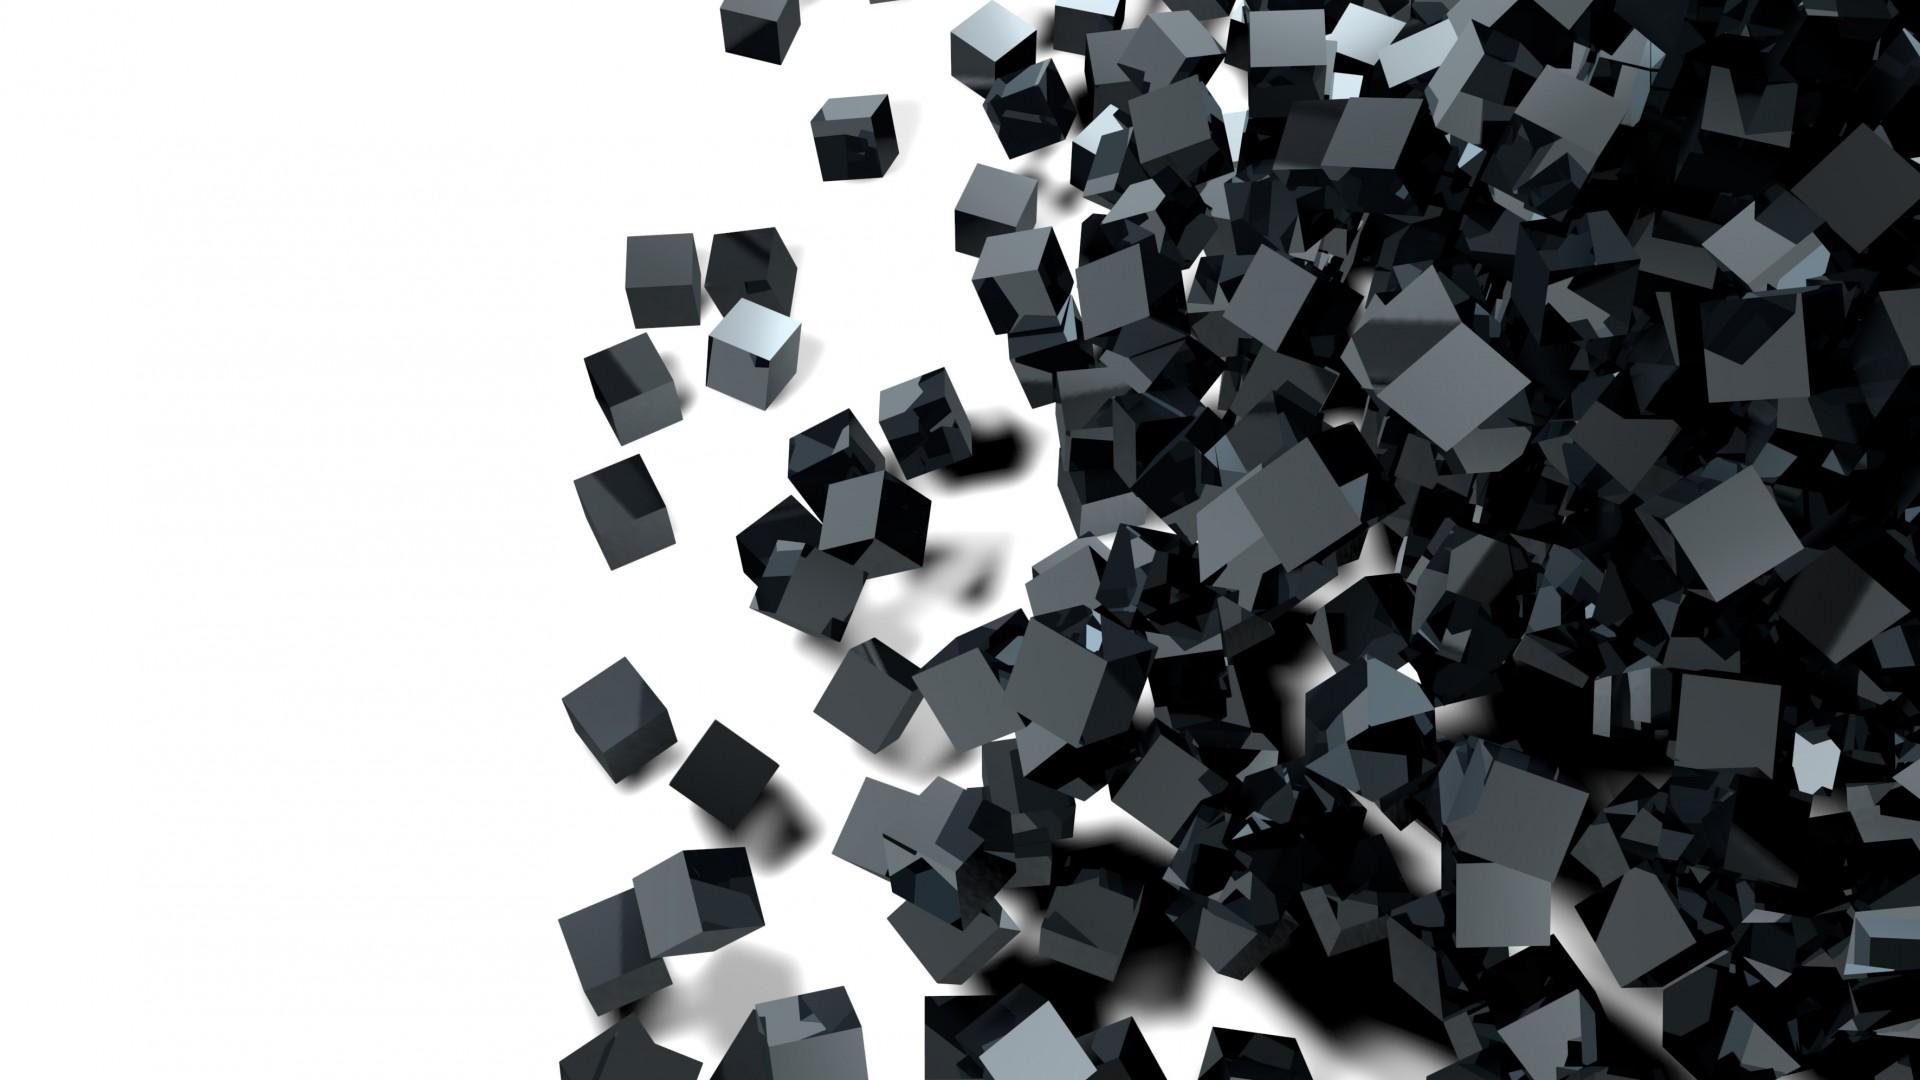 Wallpaper cube glass black 3D 4K Abstract